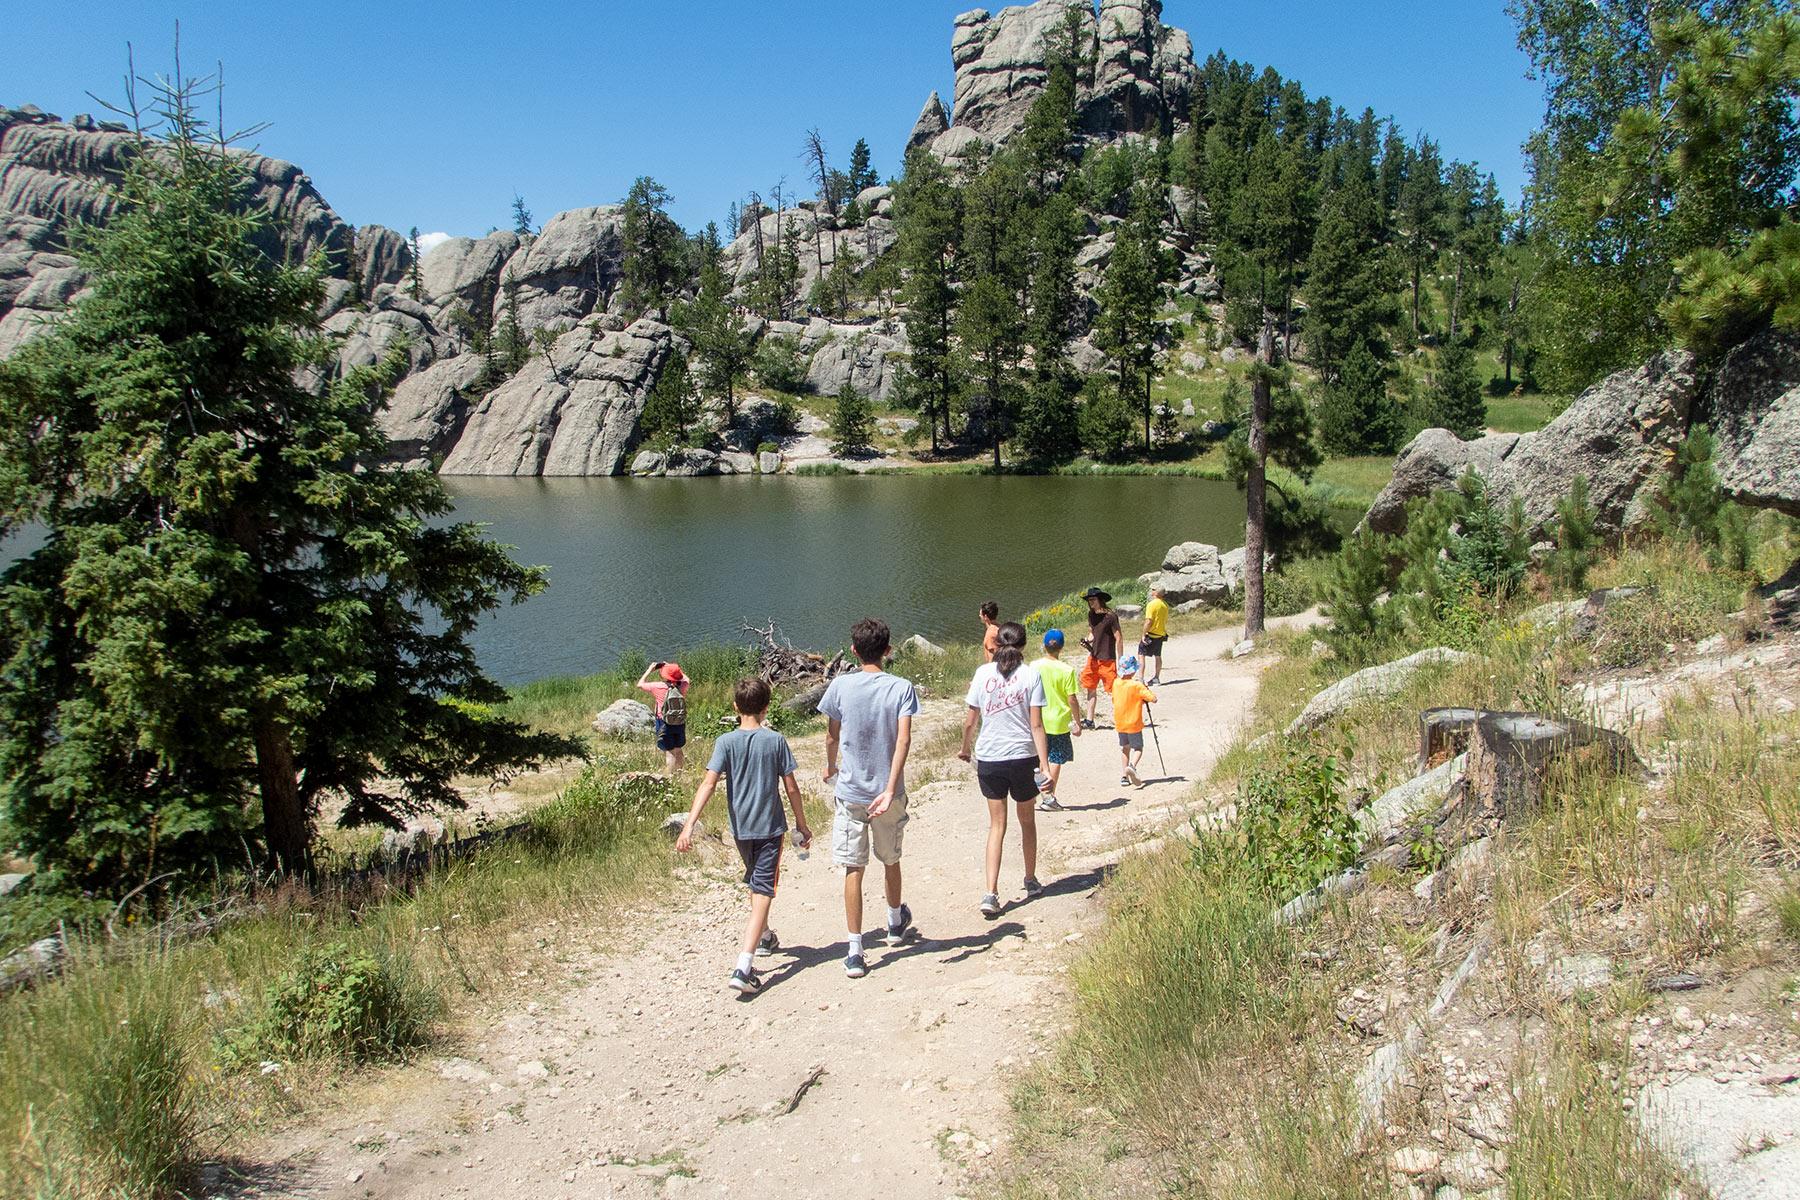 Custer State Park: What to do at Sylvan Lake - Carltonaut's Travel Tips